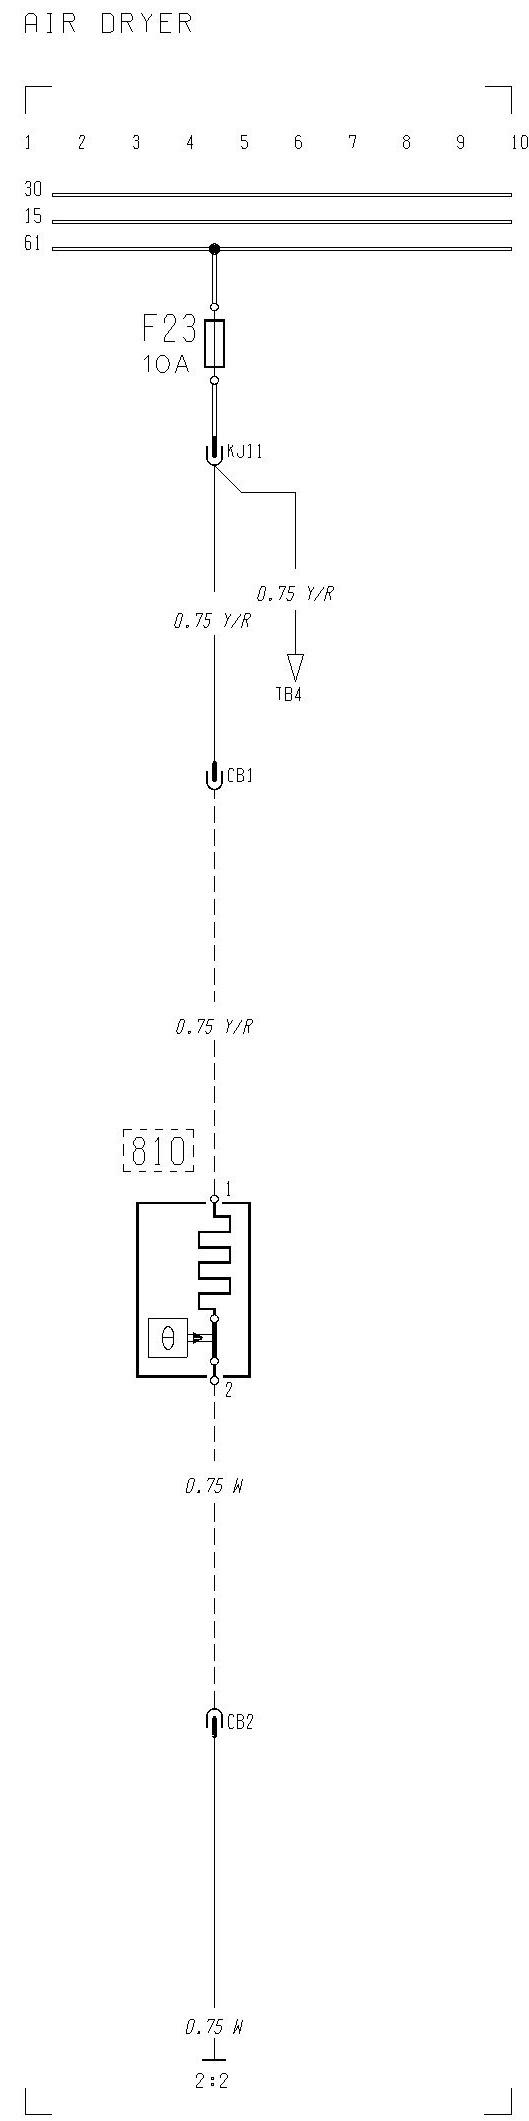 Volvo F12  F16 - Wiring Diagram - Air Dryer